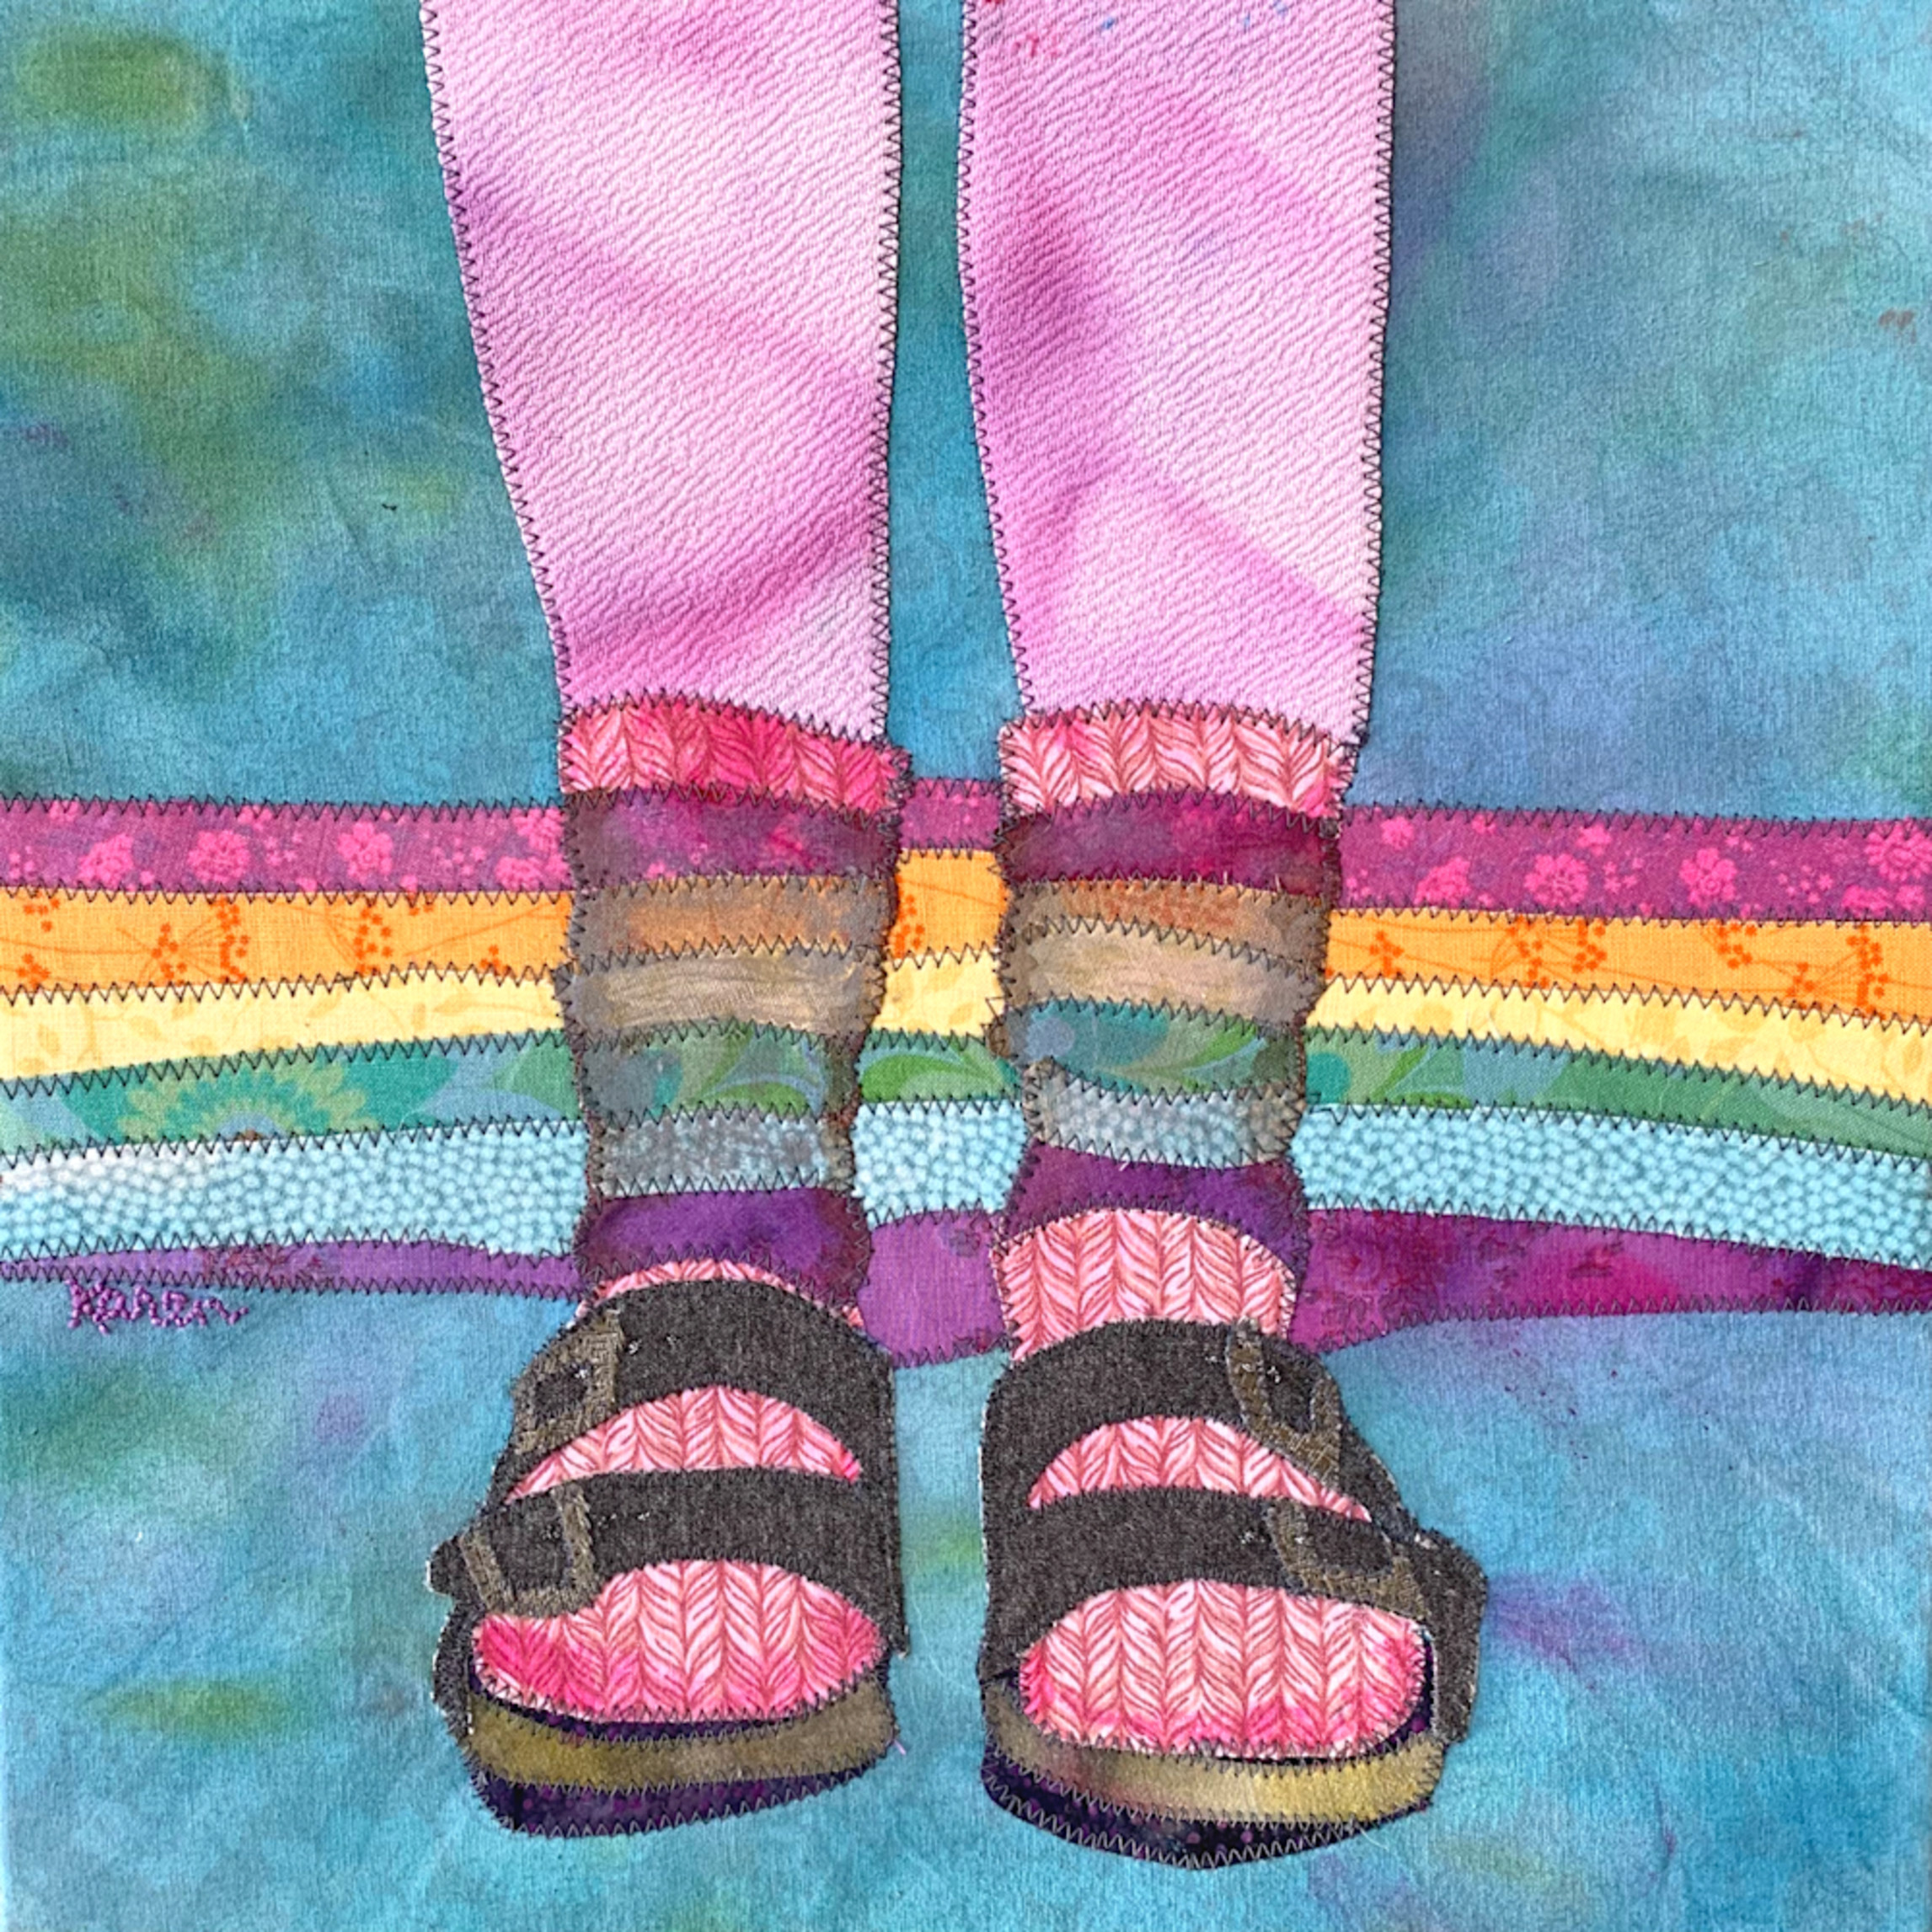 Dancing shoes7mb kqibkx